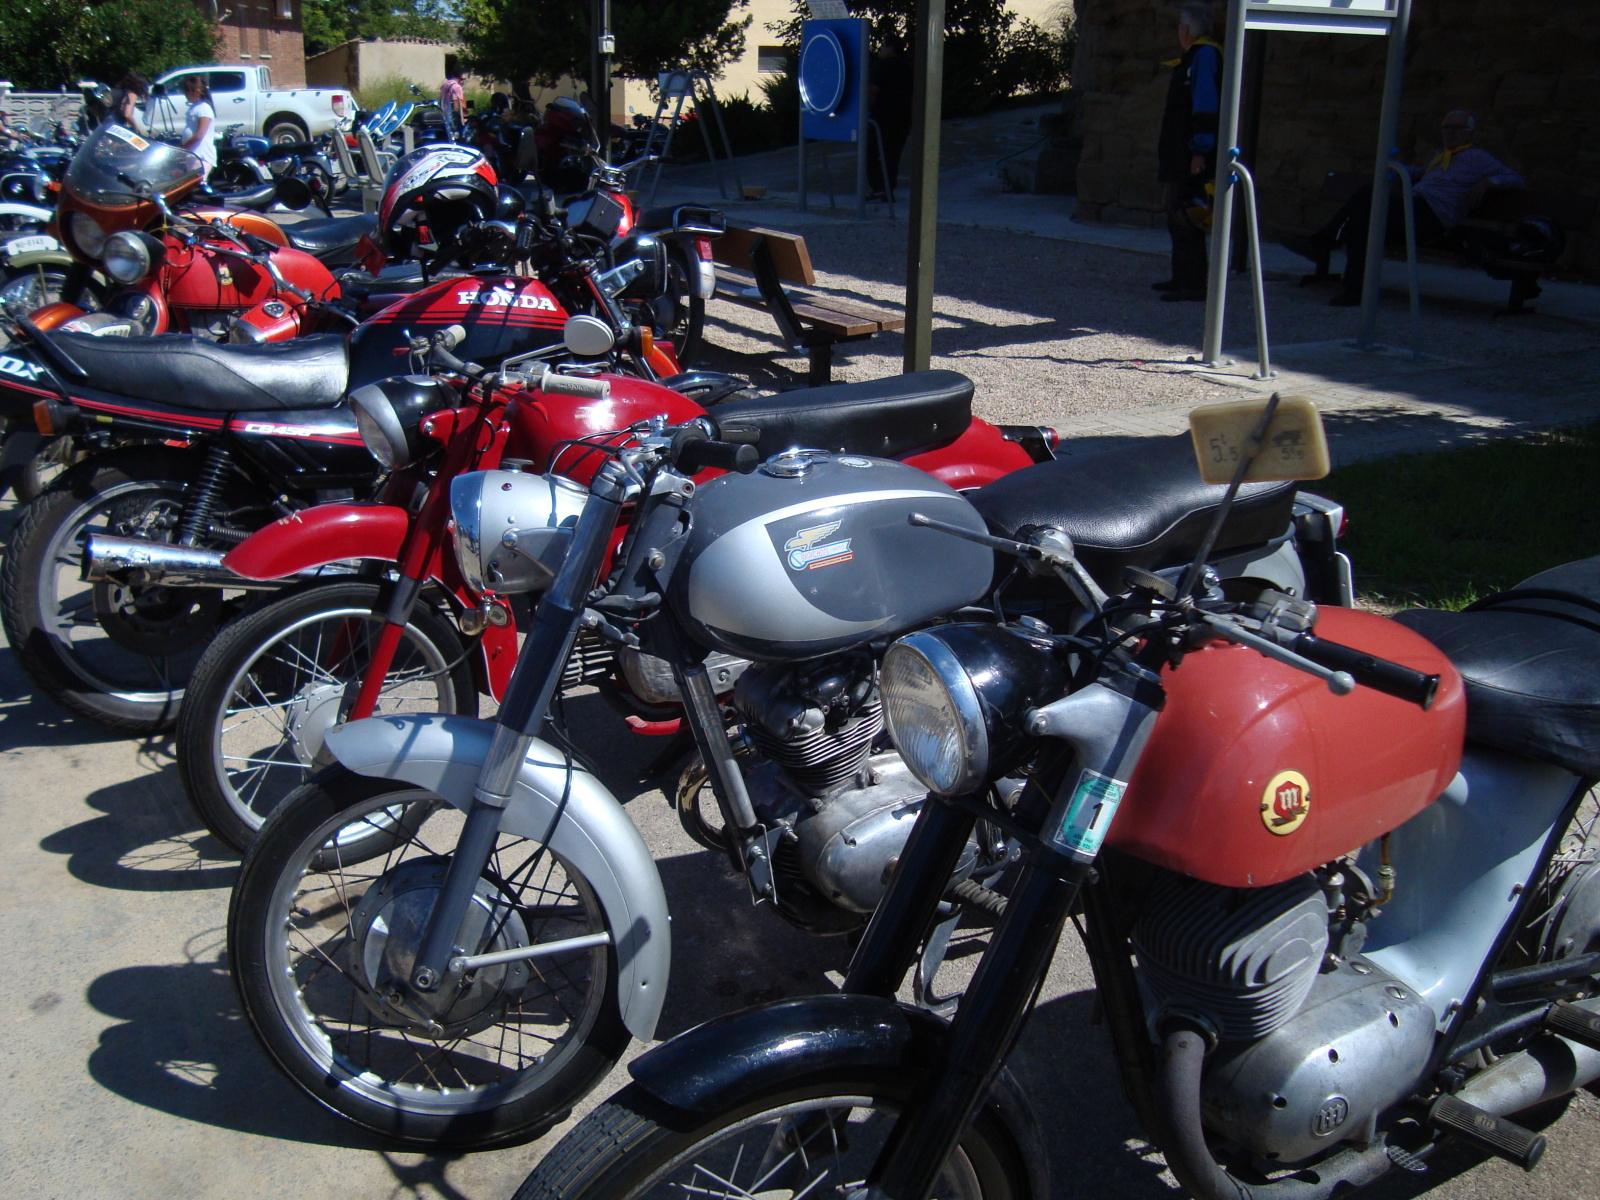 XI concentracion de motos antiguas en Alberuela de tubo (Huesca) 25k4sgy